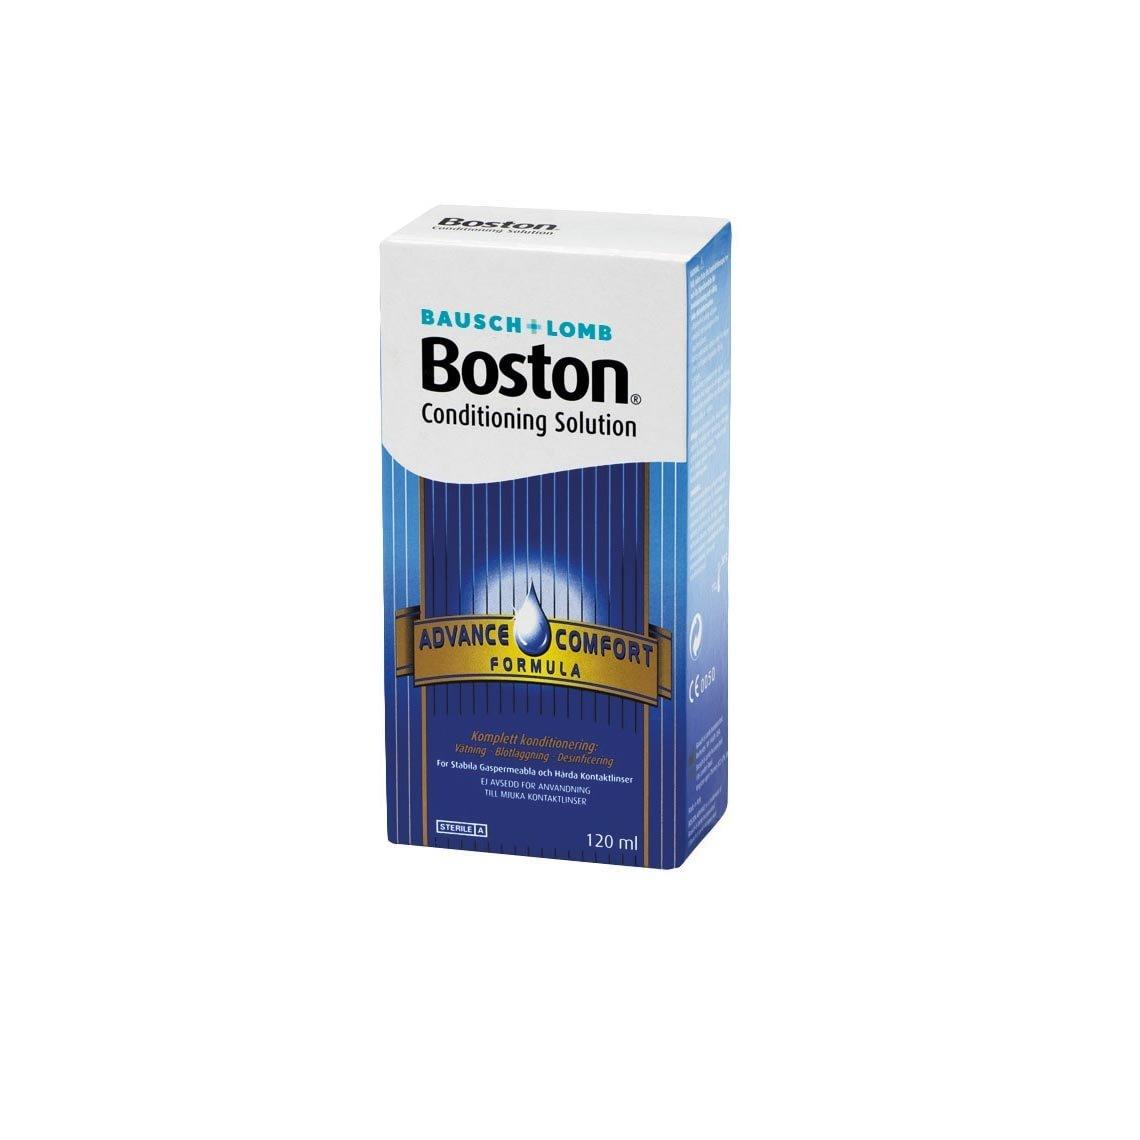 Boston Advance Conditioning Solution  120 ml